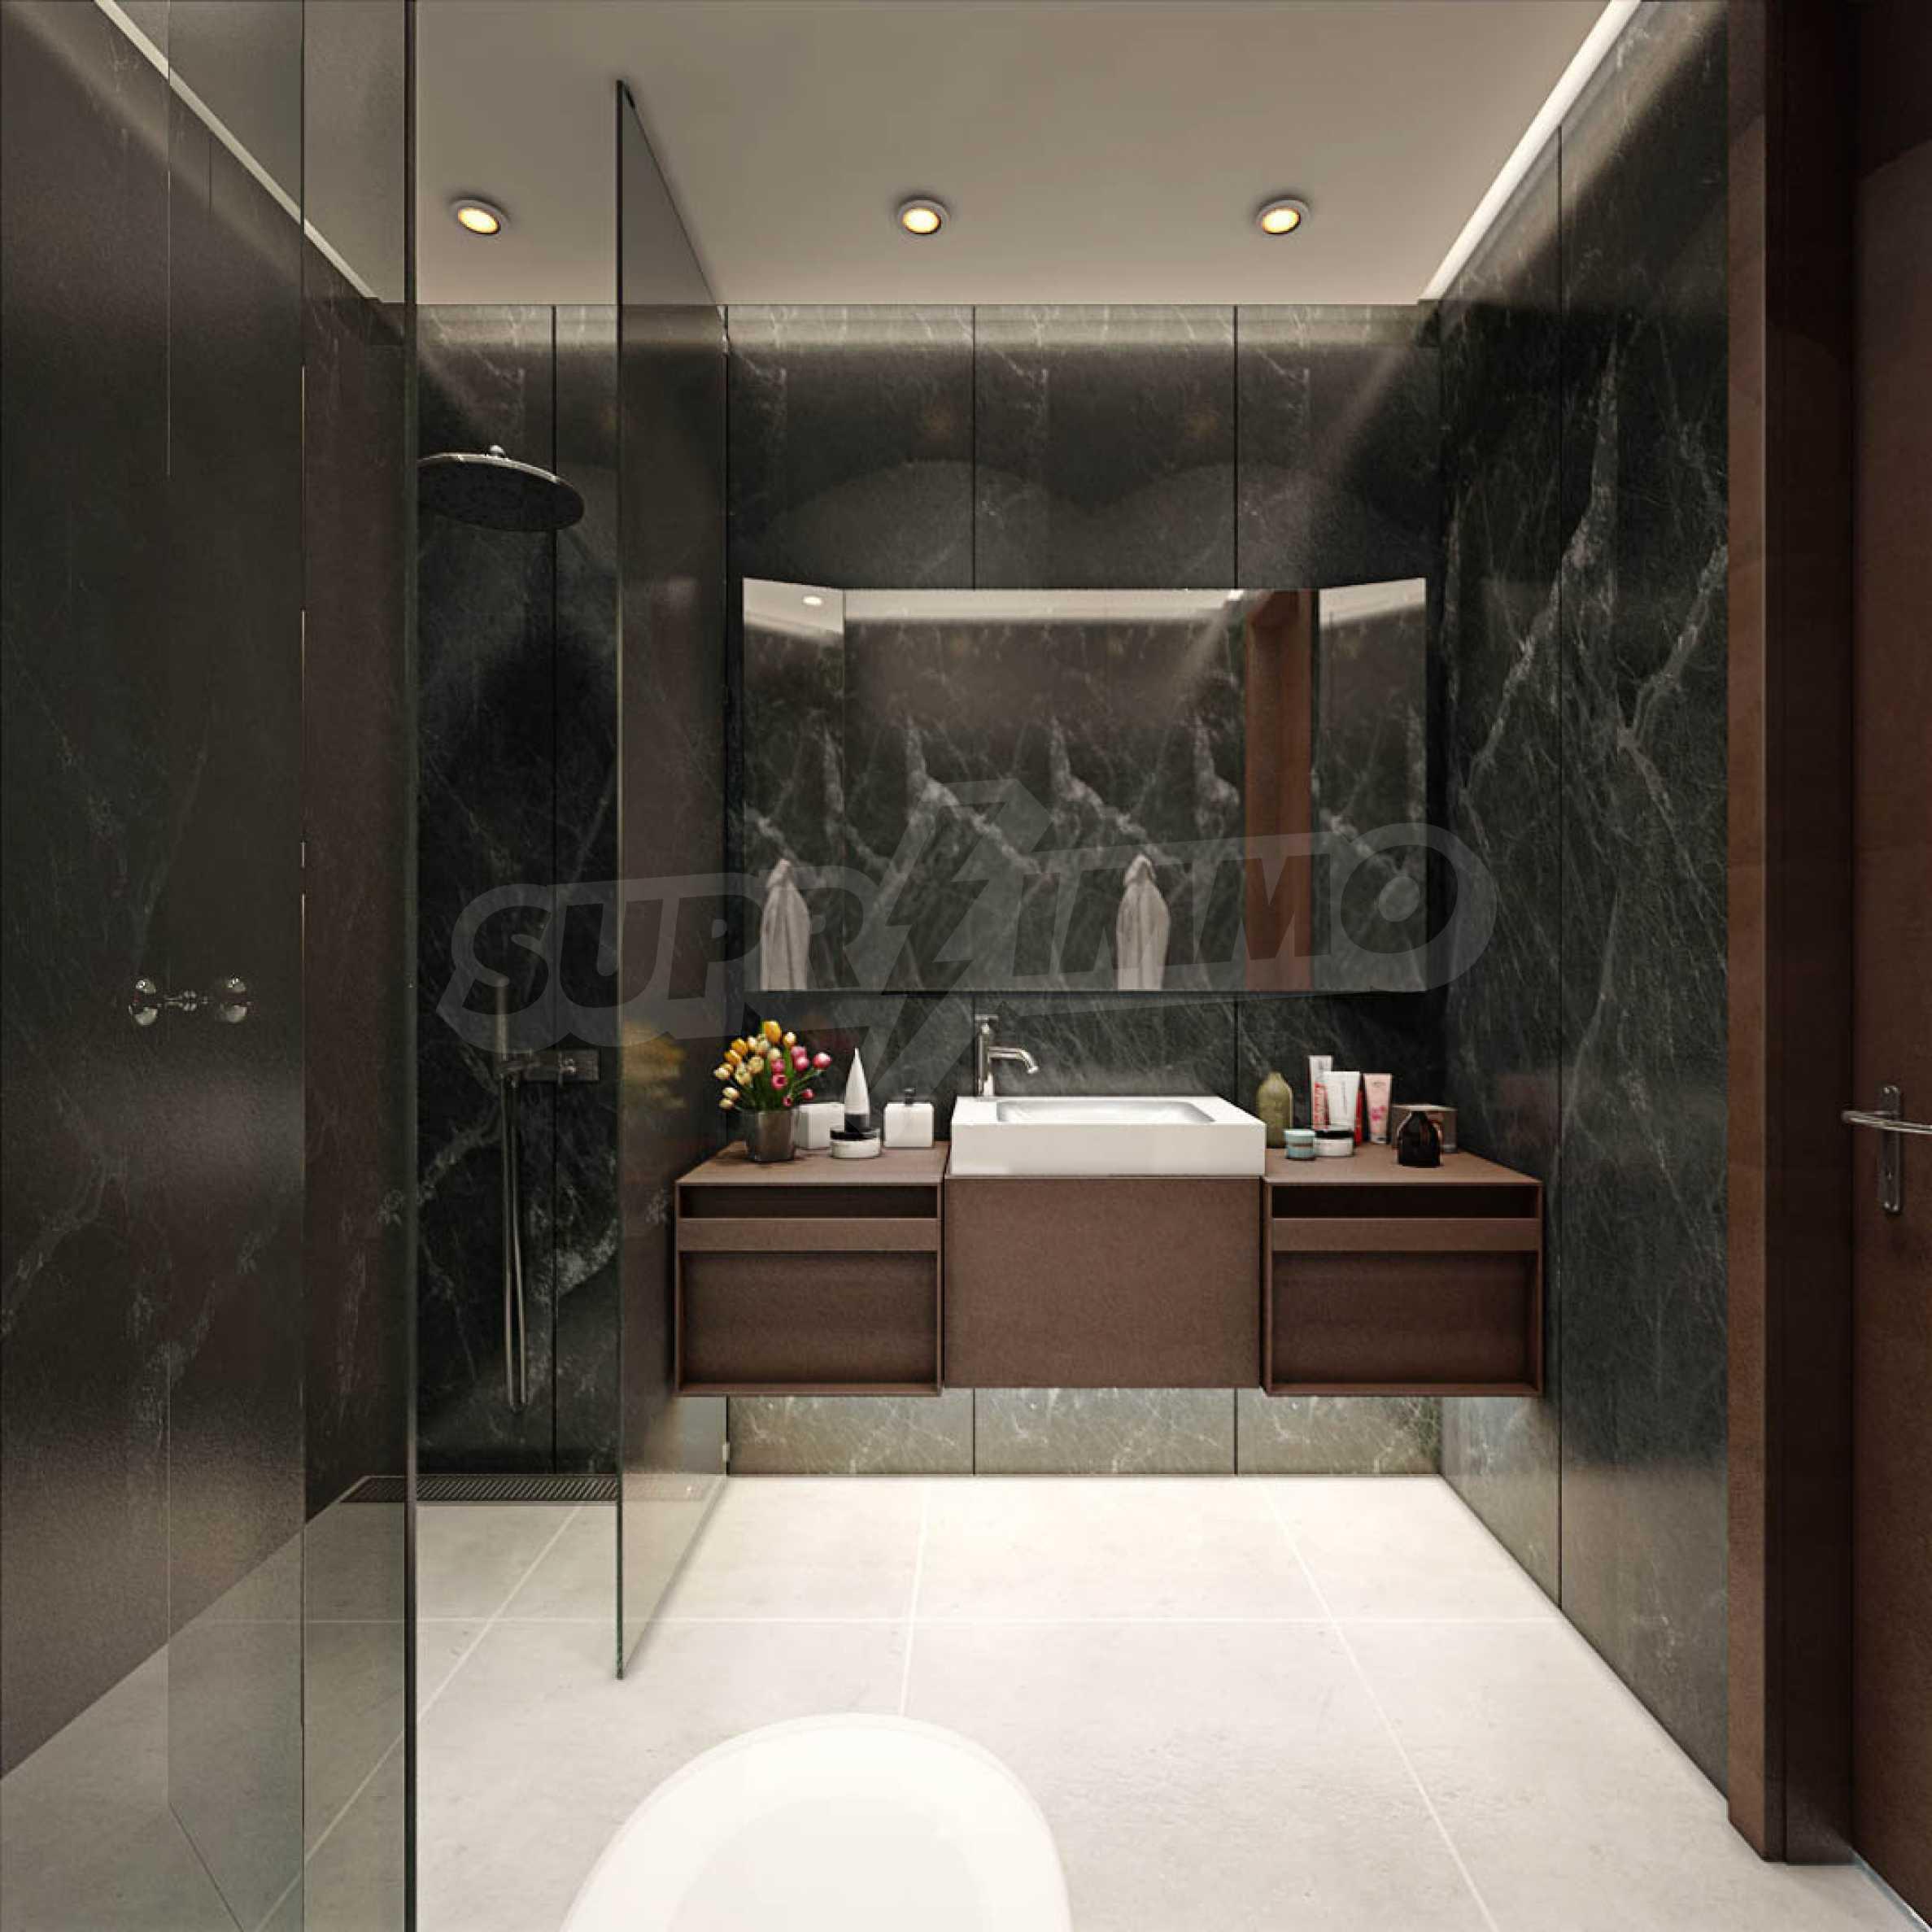 Нова сграда с луксозни апартаменти в гр. Бургас 37